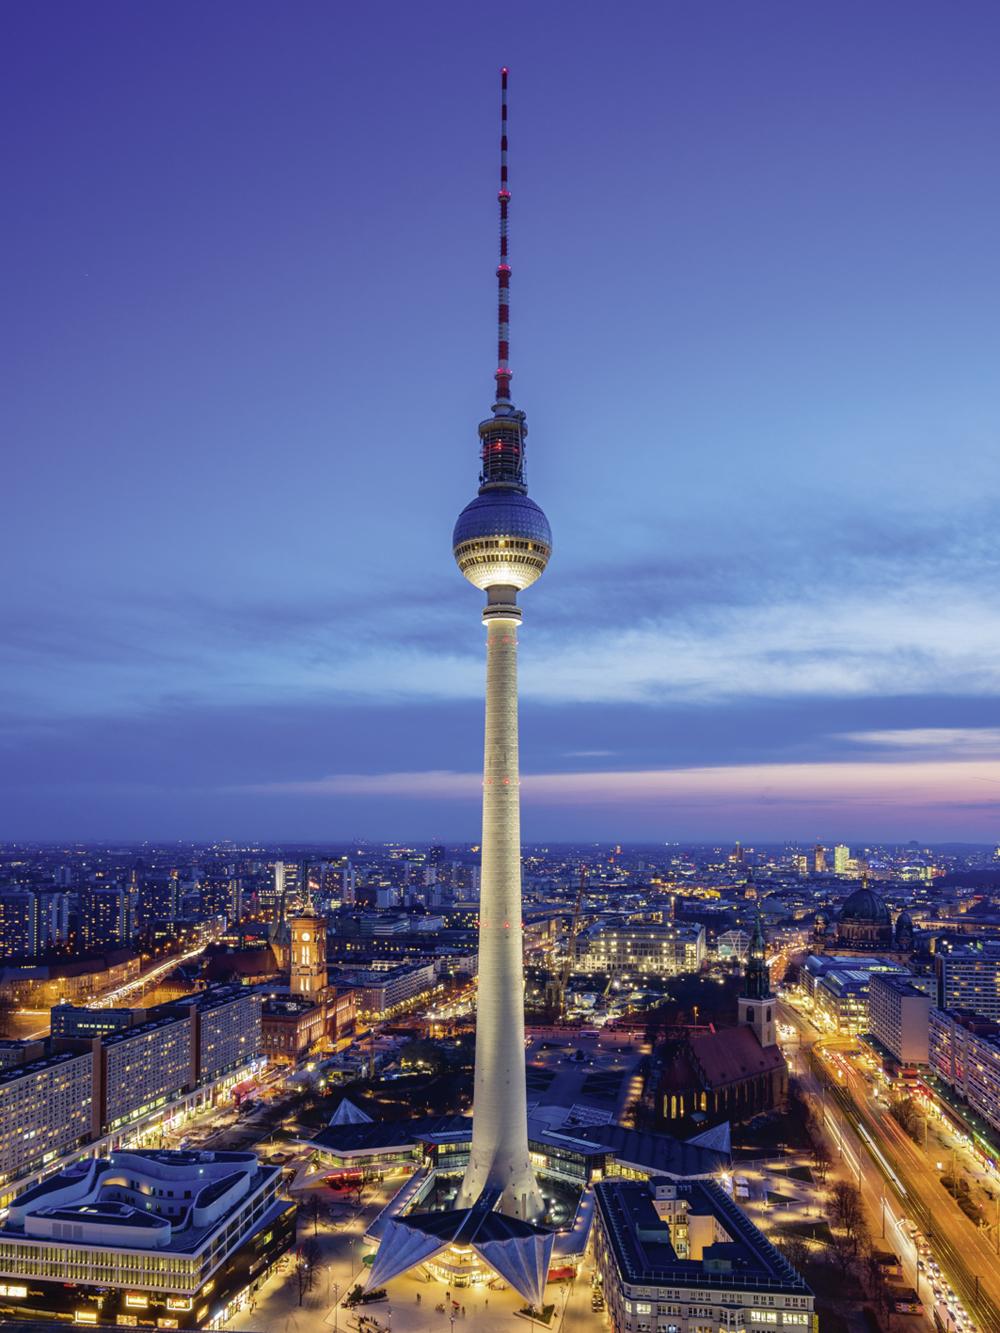 David Engel Berlin Fernsehturm Glasbild Jetzt Entdecken Bei Www Artgalerie Bildershop De Fernsehturm Fernsehturm Berlin Turm